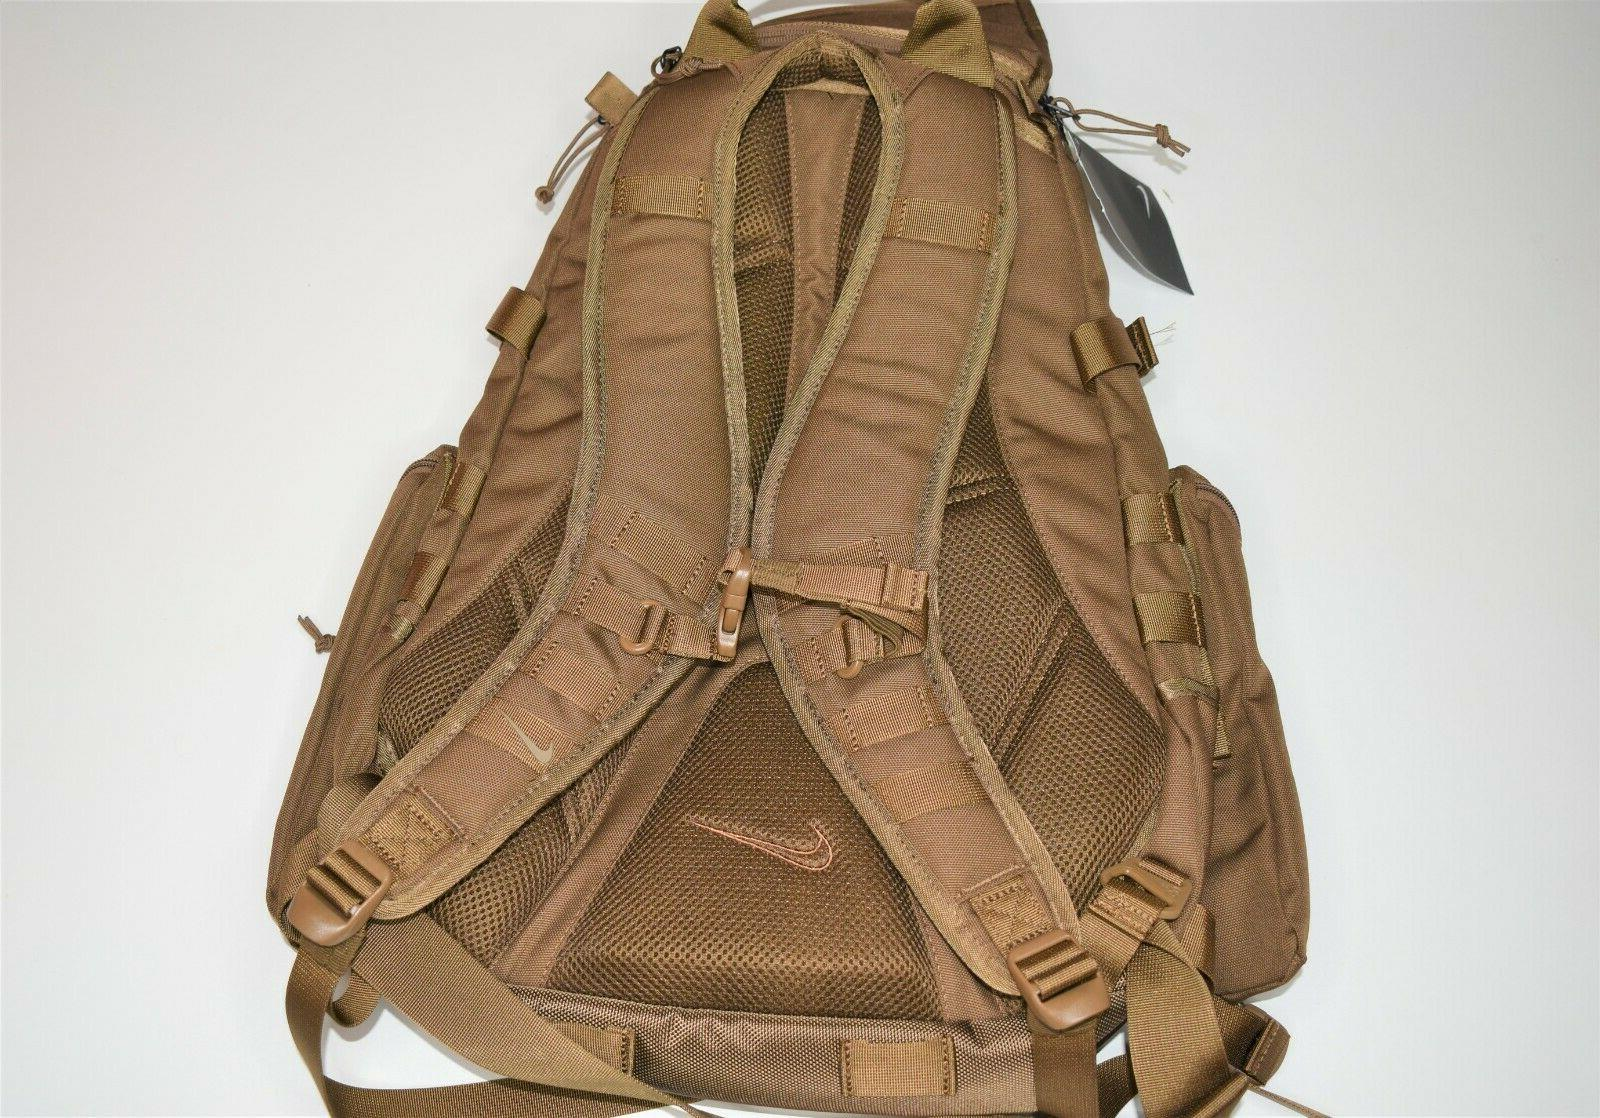 New Nike Backpack BA4886-222 Military Brown MSRP:$150